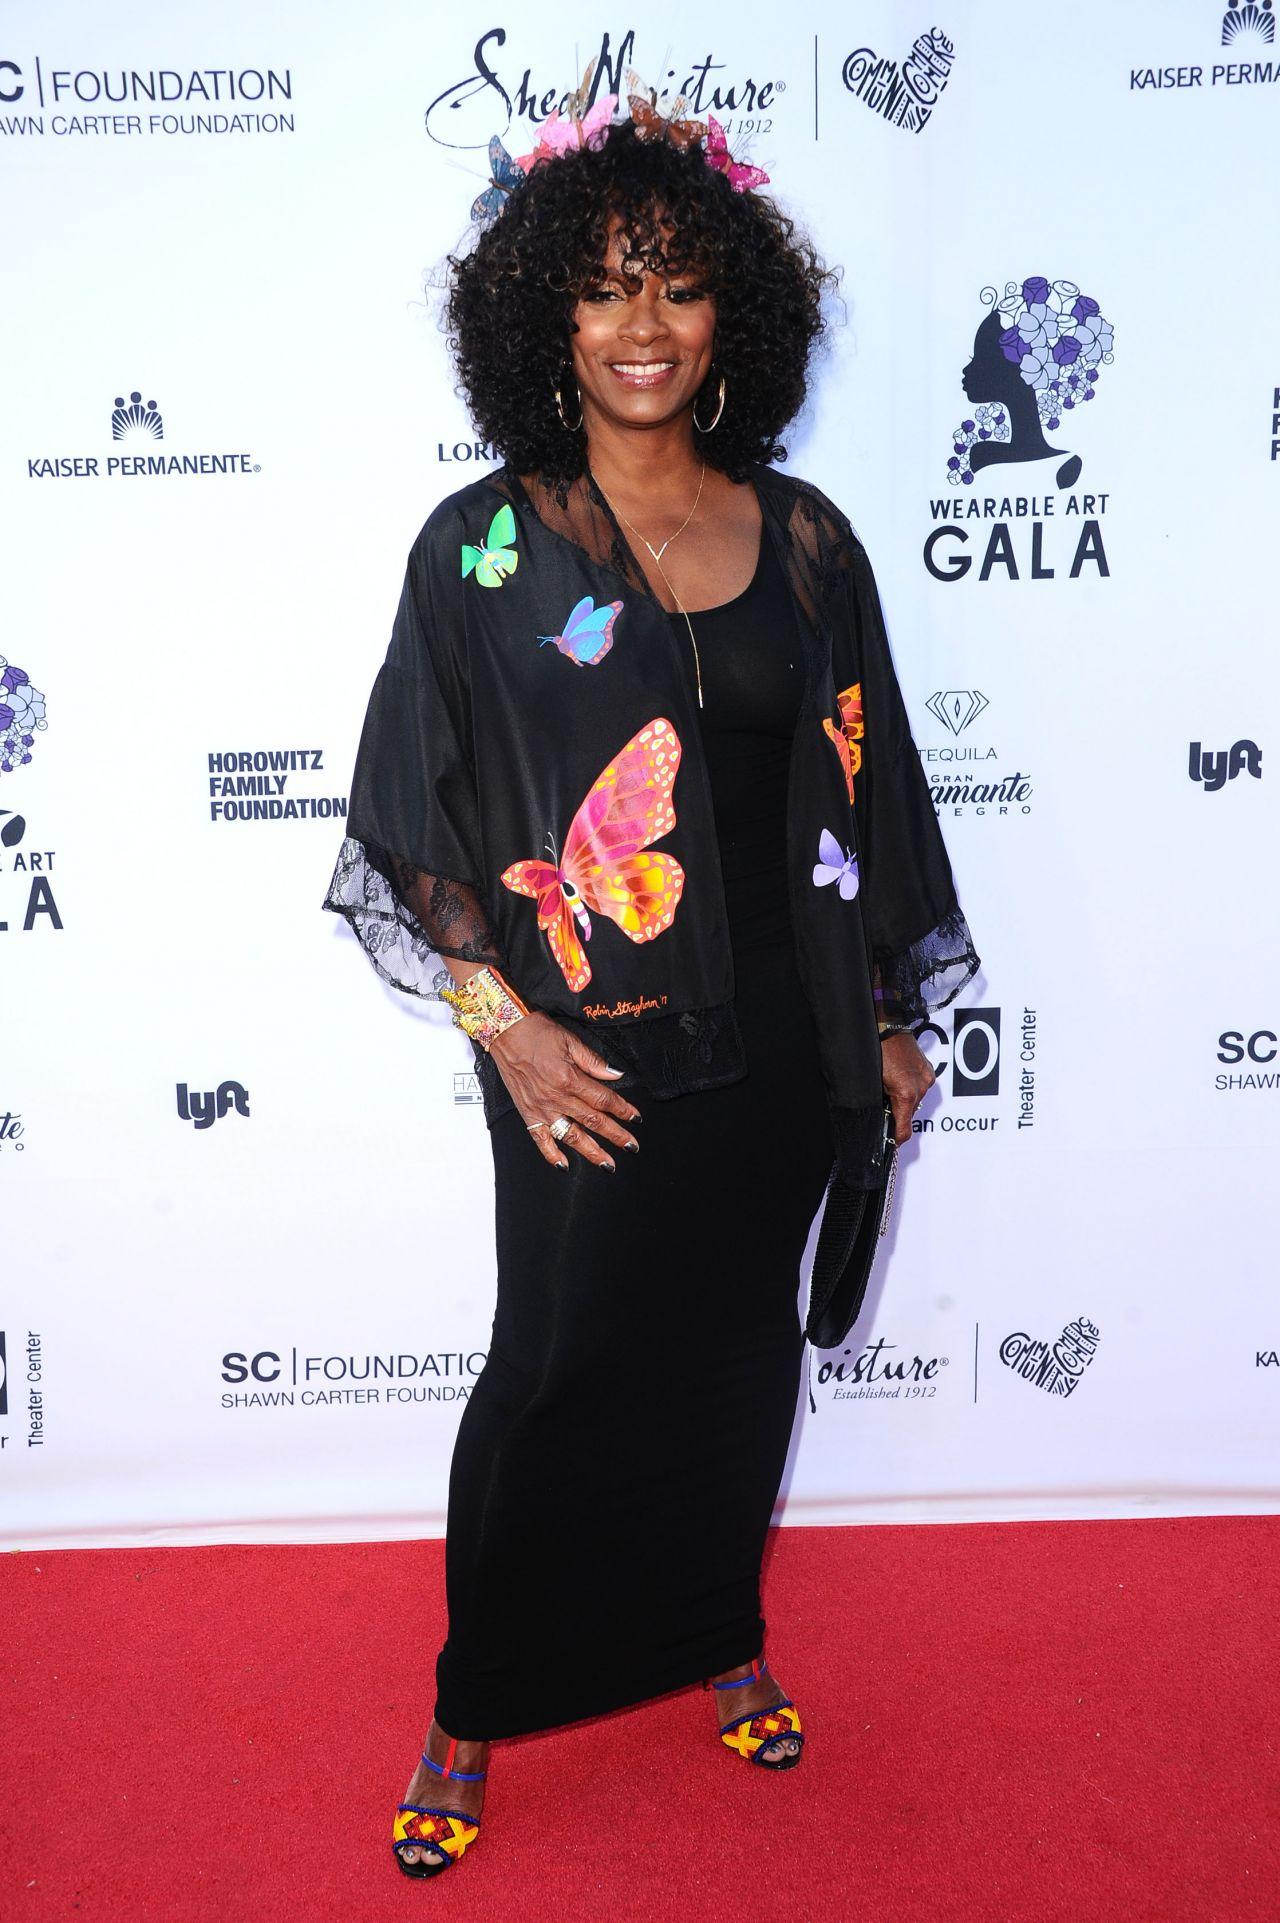 vanessa bell wearable art gala in california african